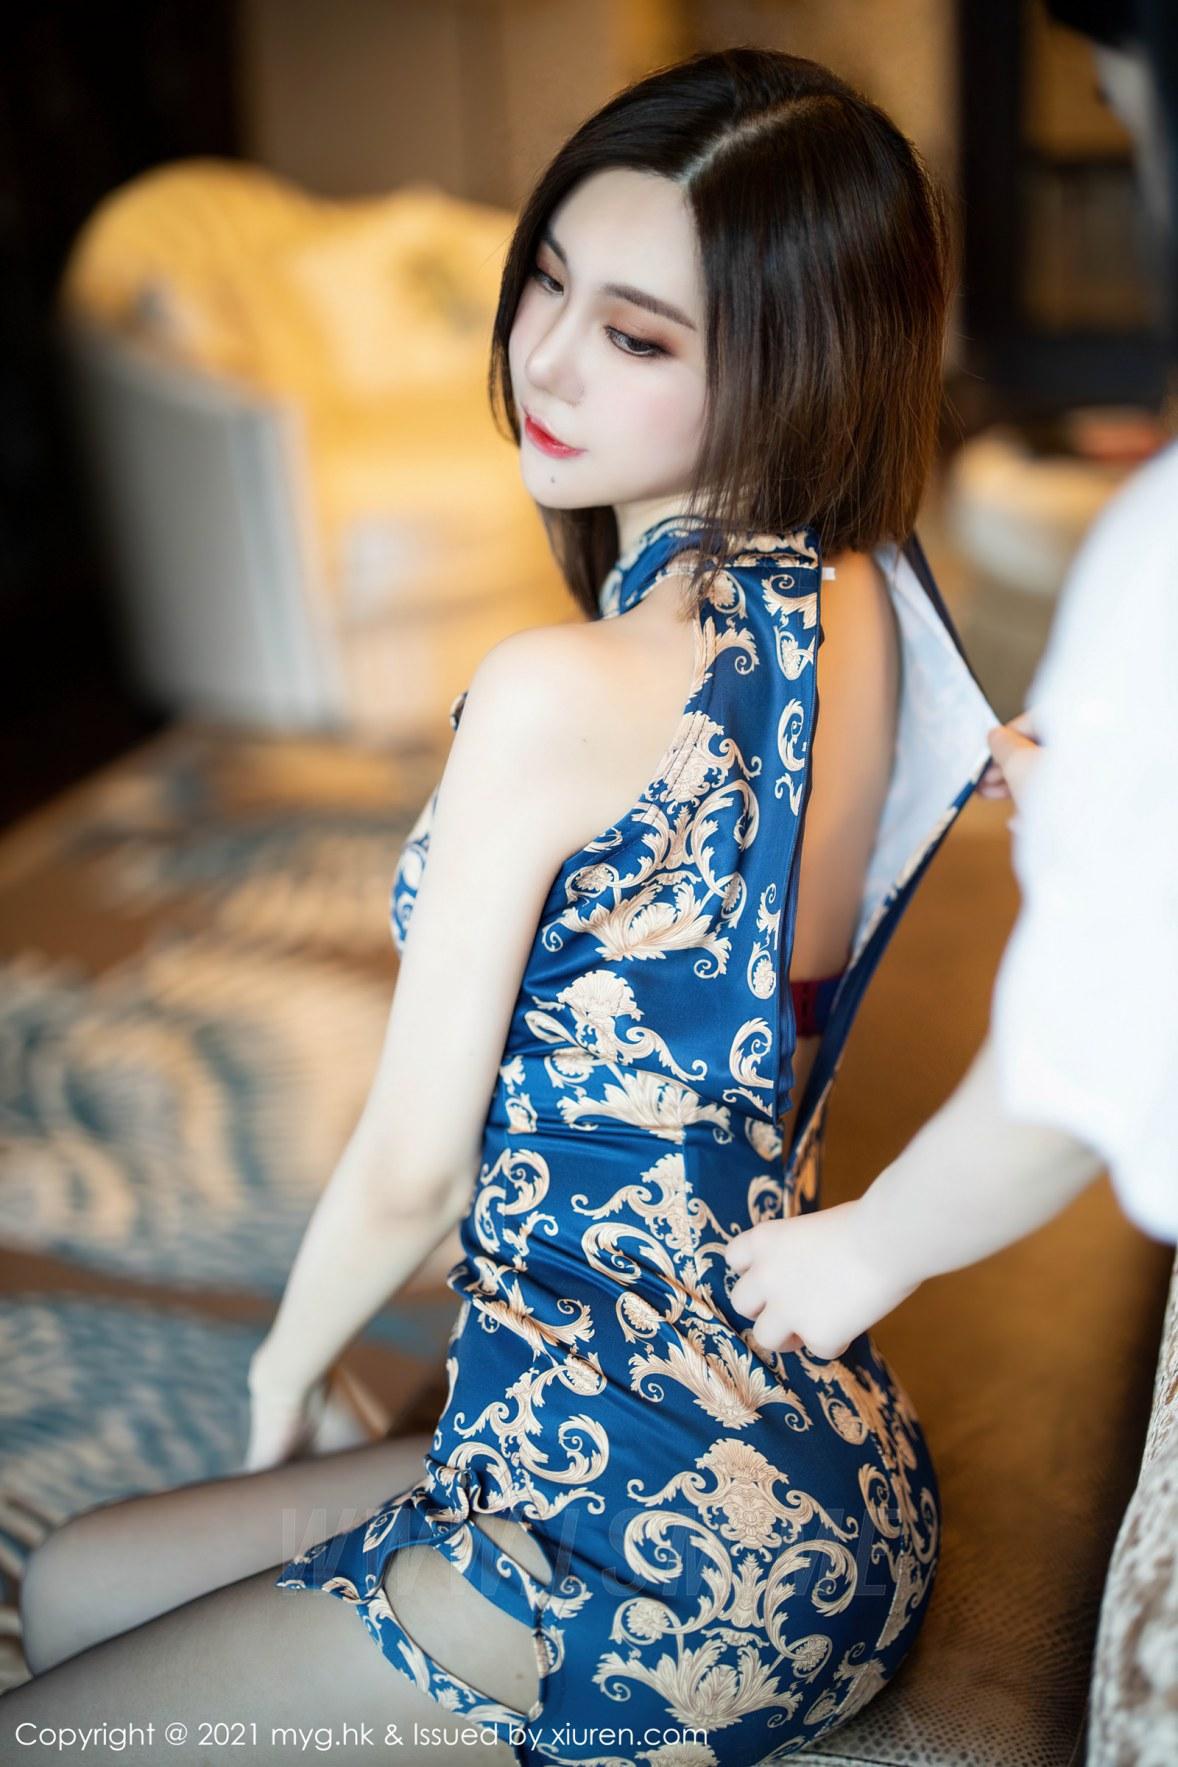 MyGirl 美媛馆 Vol.528 古典韵味浪漫旗袍 绮里嘉Carina 性感写真 - 3